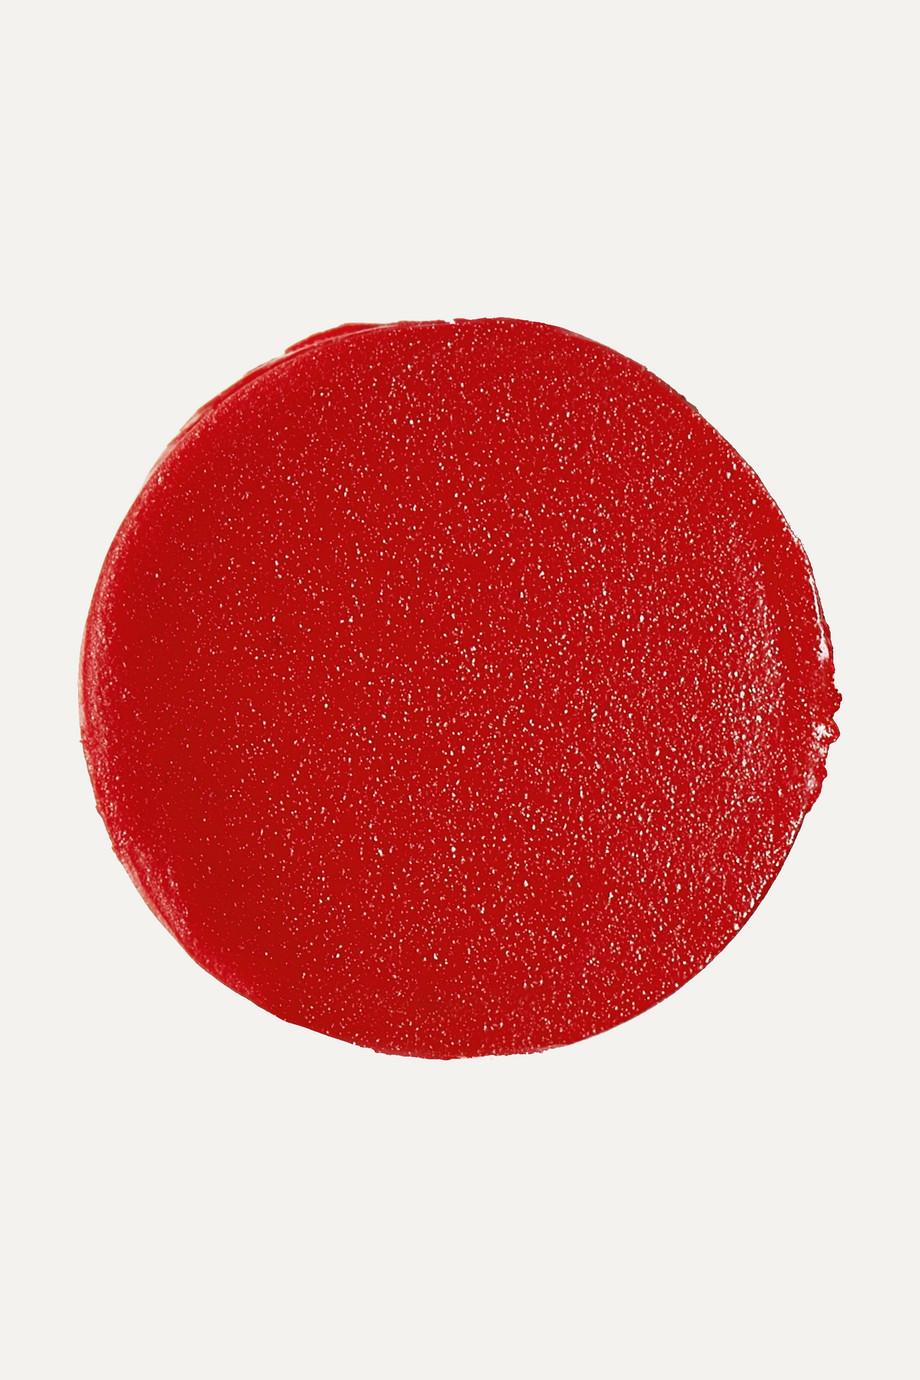 Gucci Beauty Rouge à Lèvres Satin - Odalie Red 500